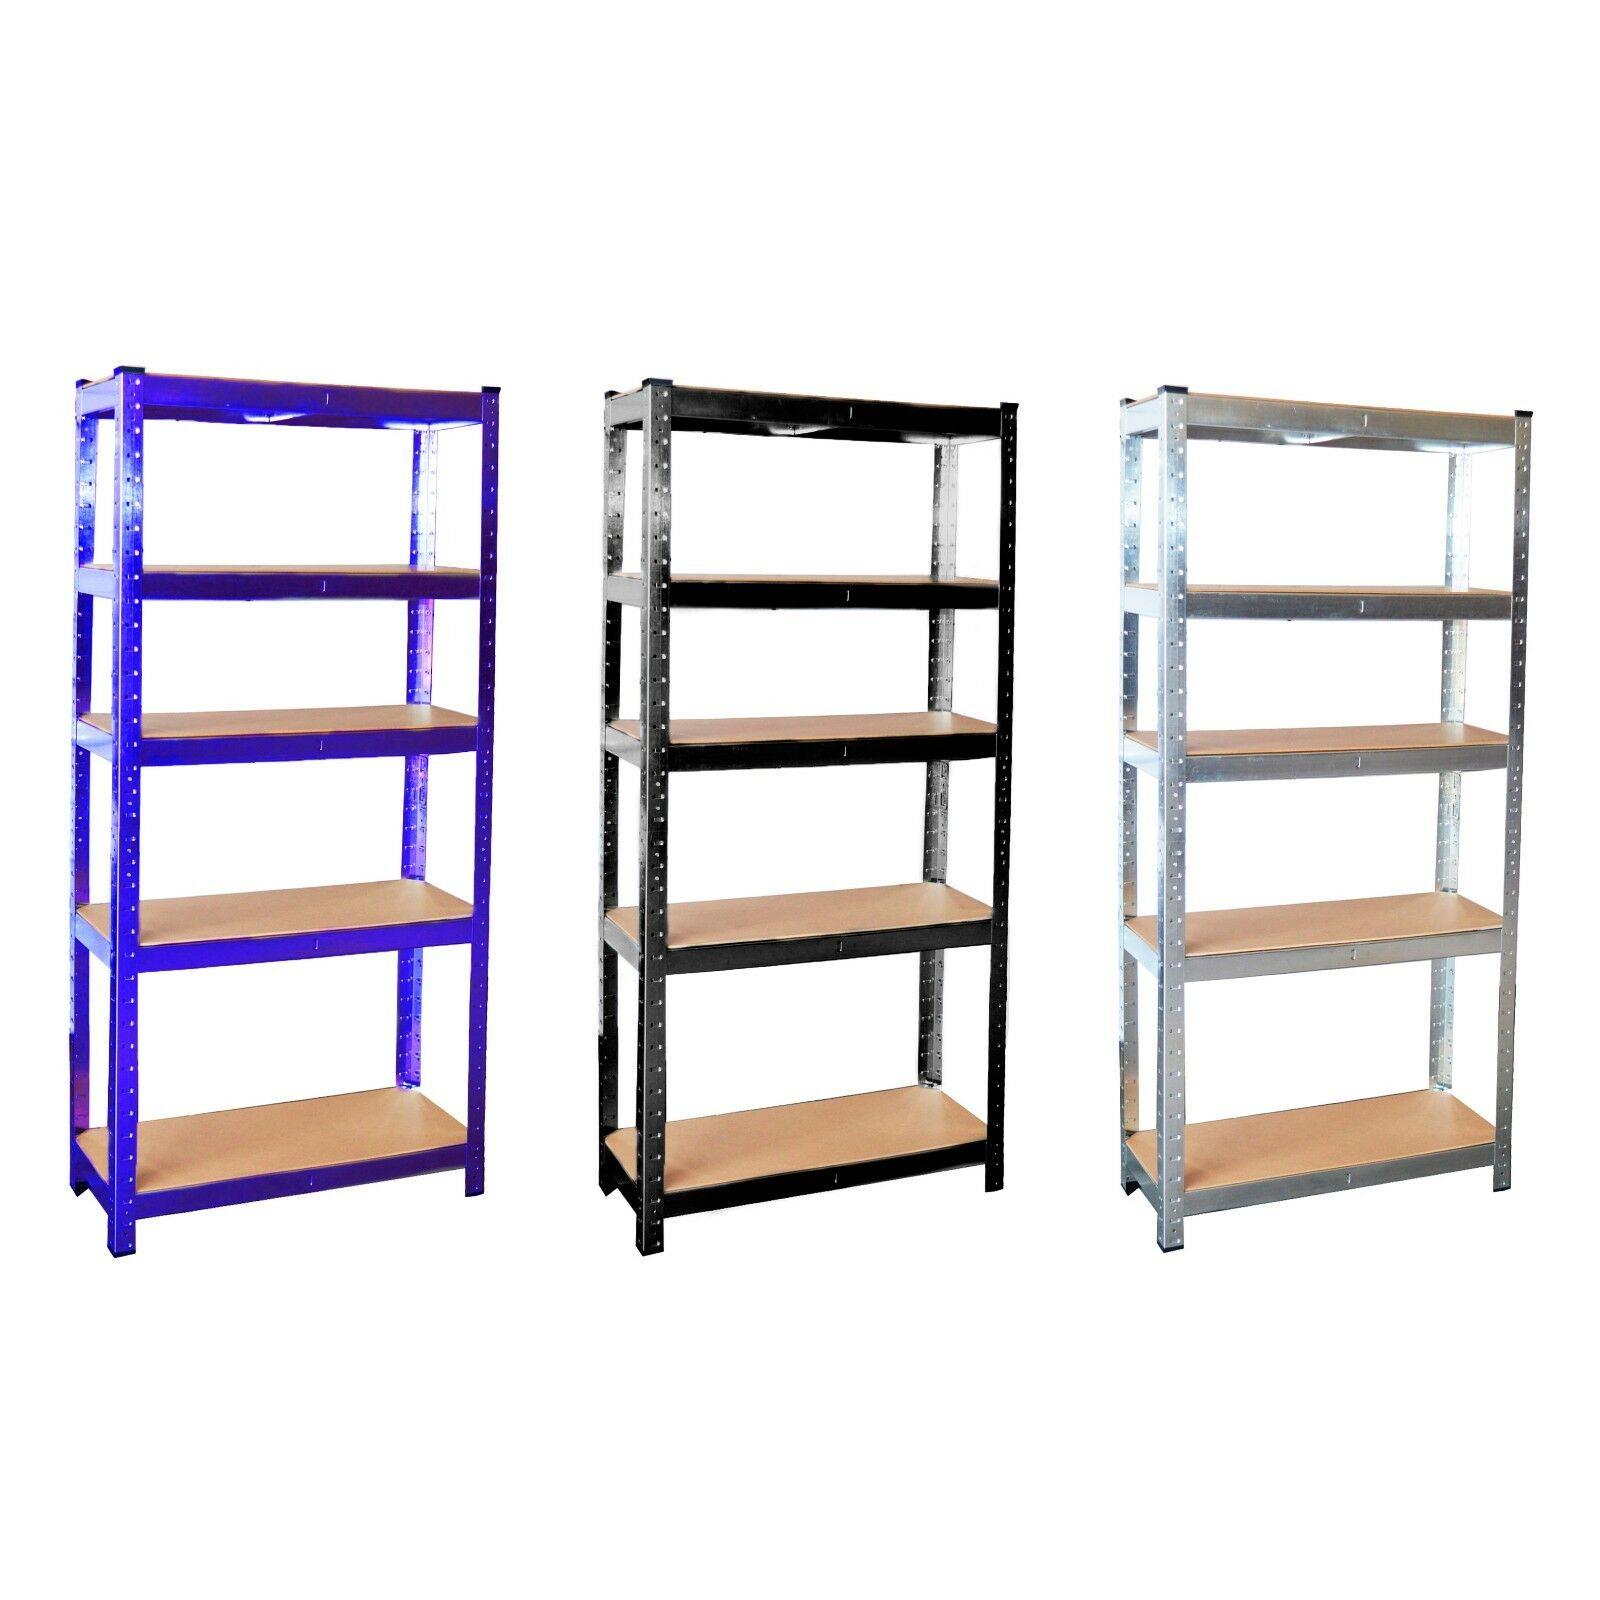 5 Tier Galvanised Steel Garage Shelving Racking Unit Storage Racks (Black or Blue) - £19.99 Delivered with code @ Neodirect eBay